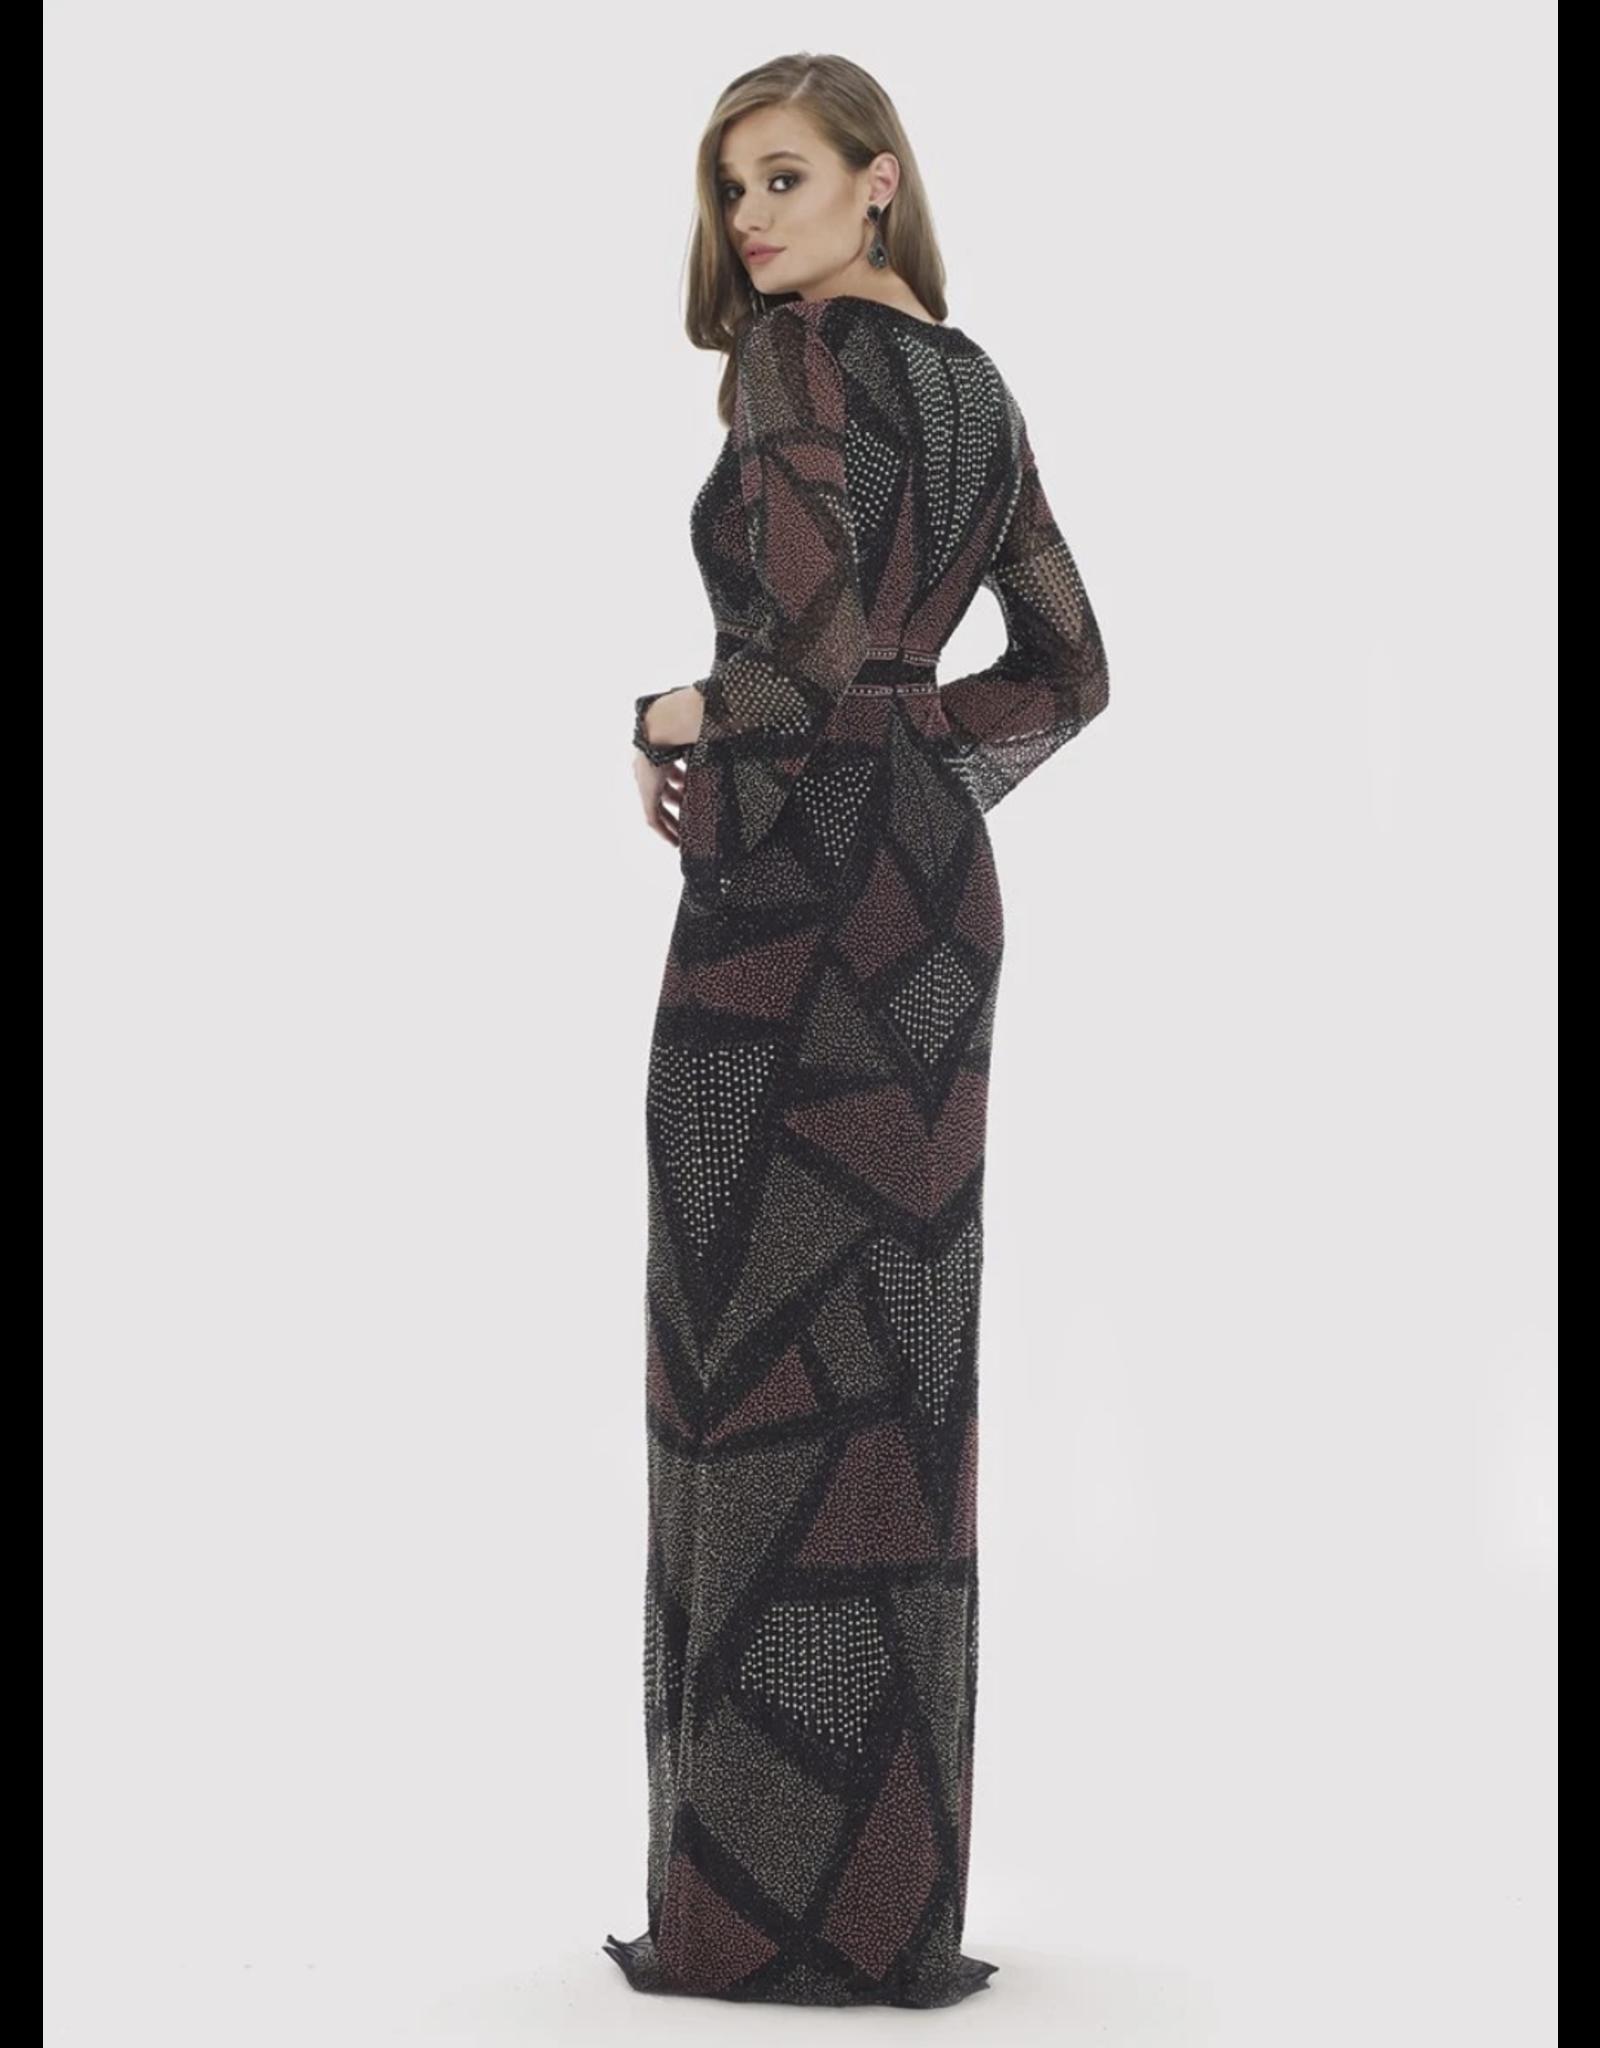 Lara 29601 Lara Dresses